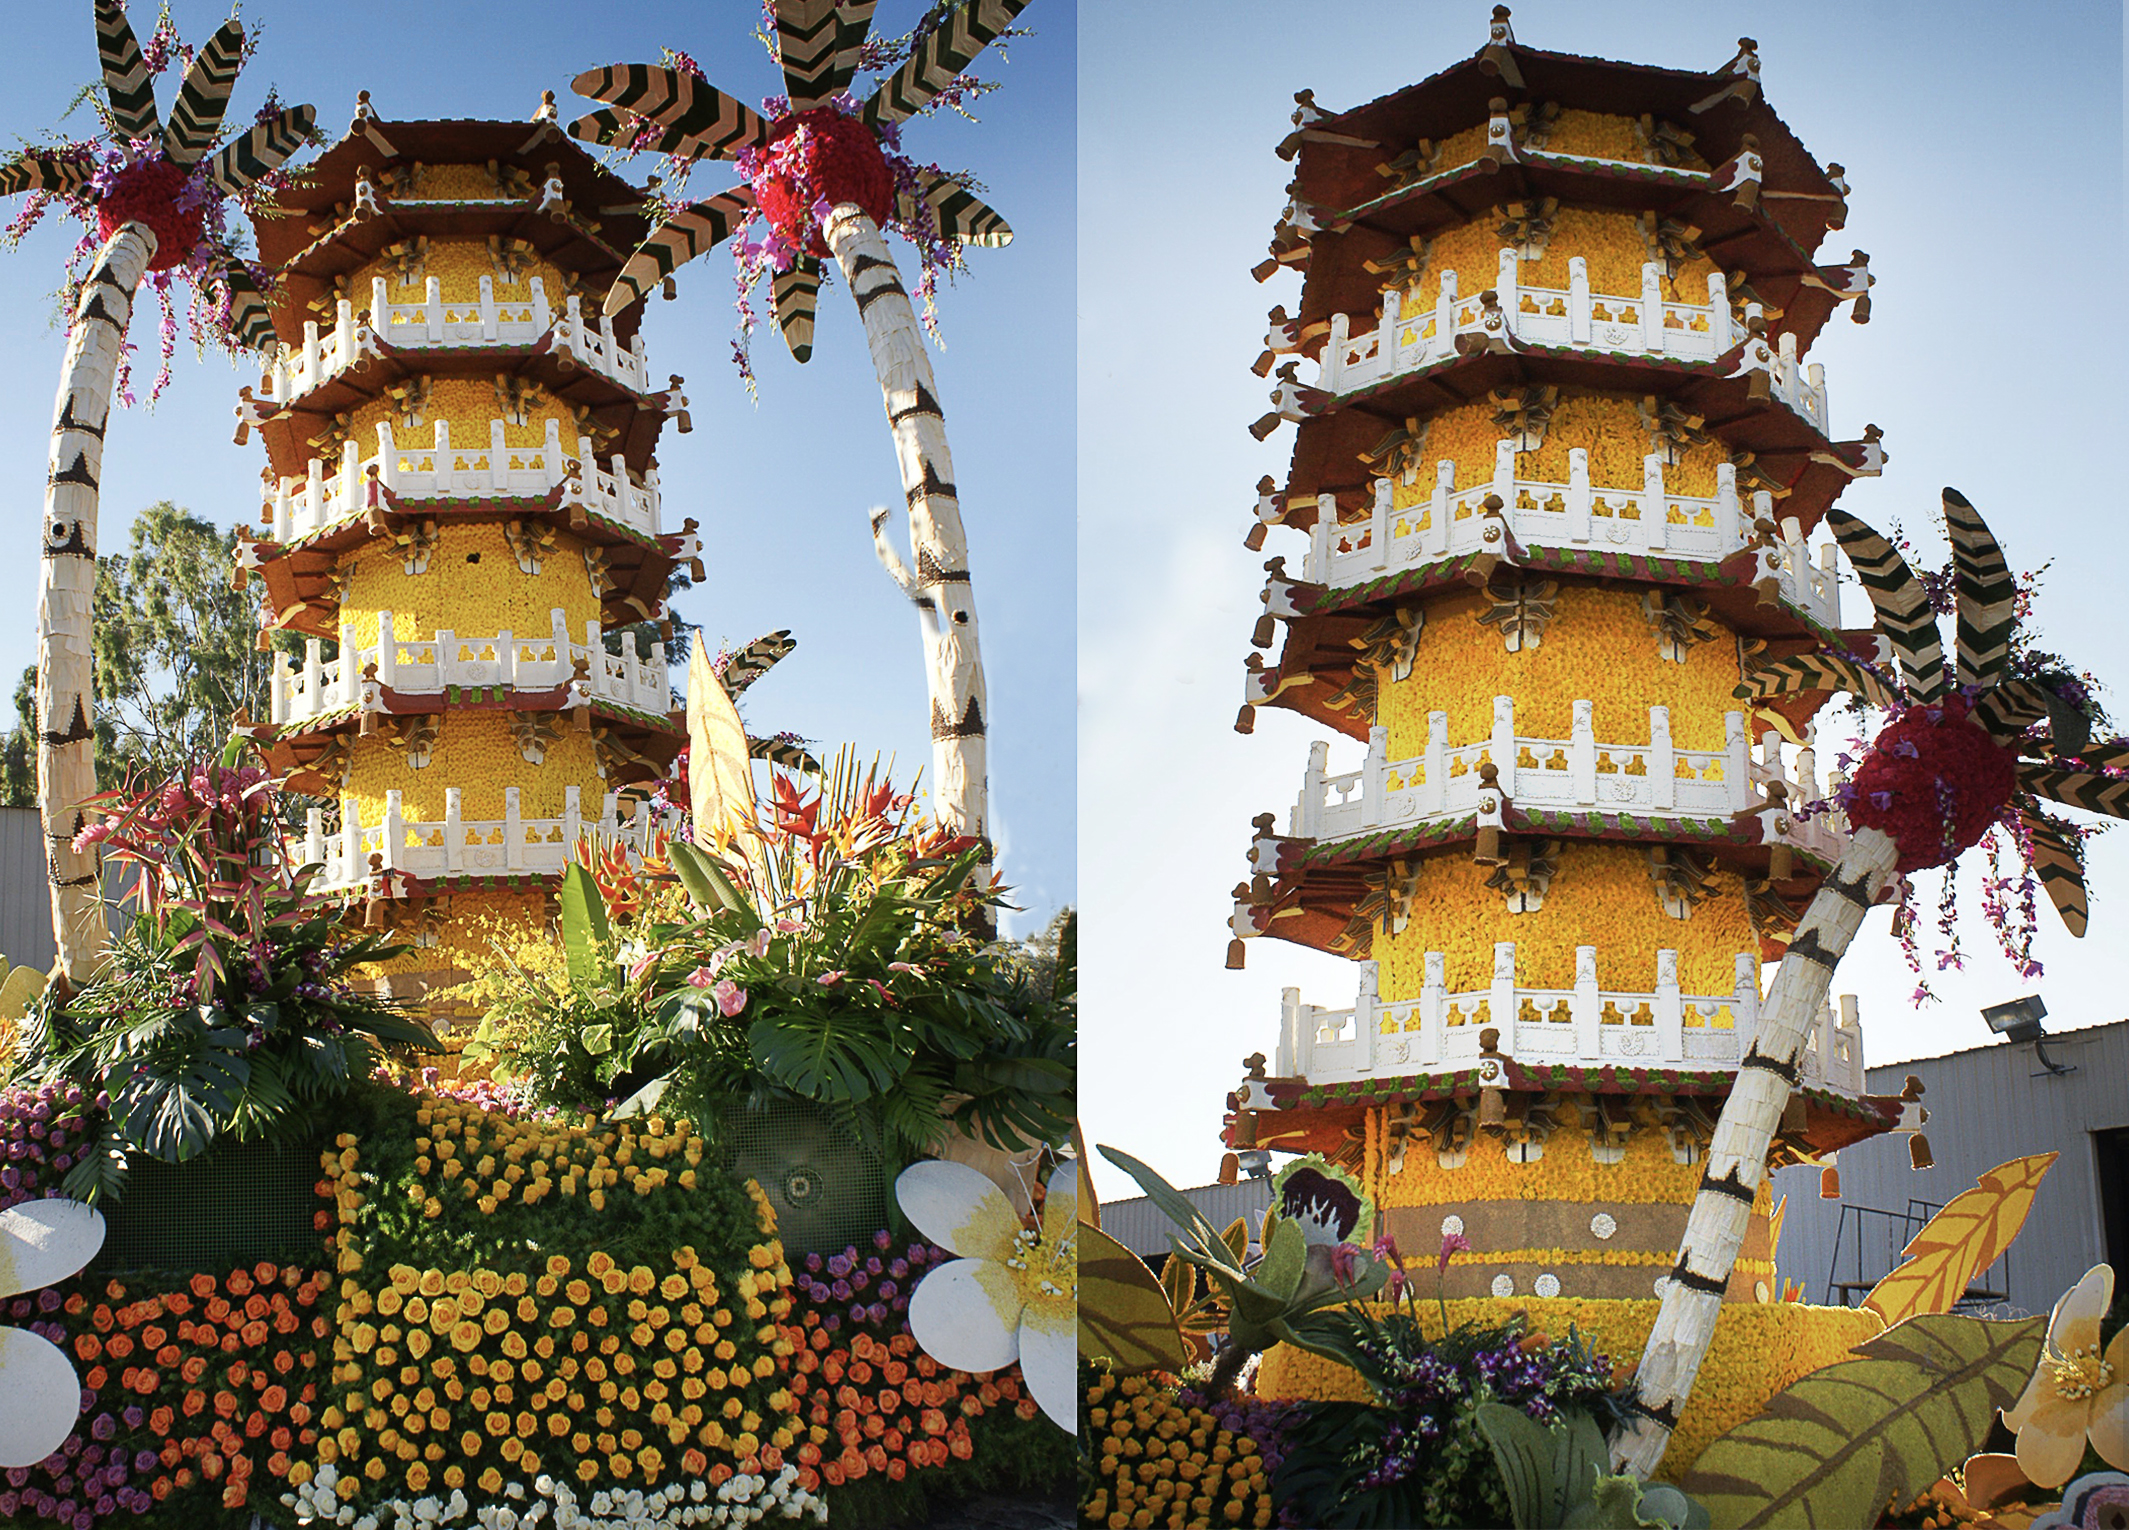 roseparade winning entries-china airline-pagoda 1.jpg